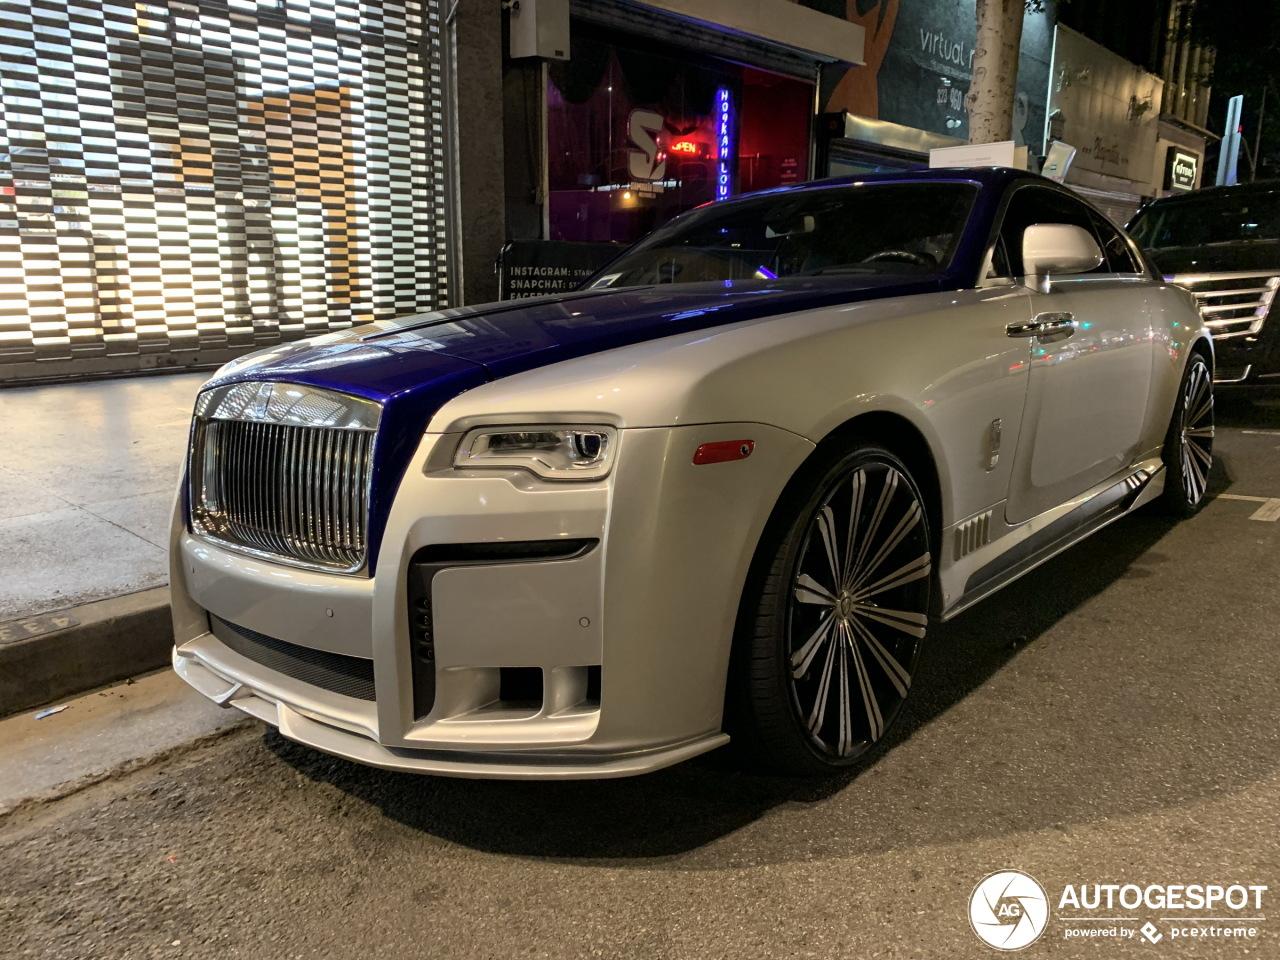 Rolls-Royce WALD Wraith Black Bison Edition - 24 January